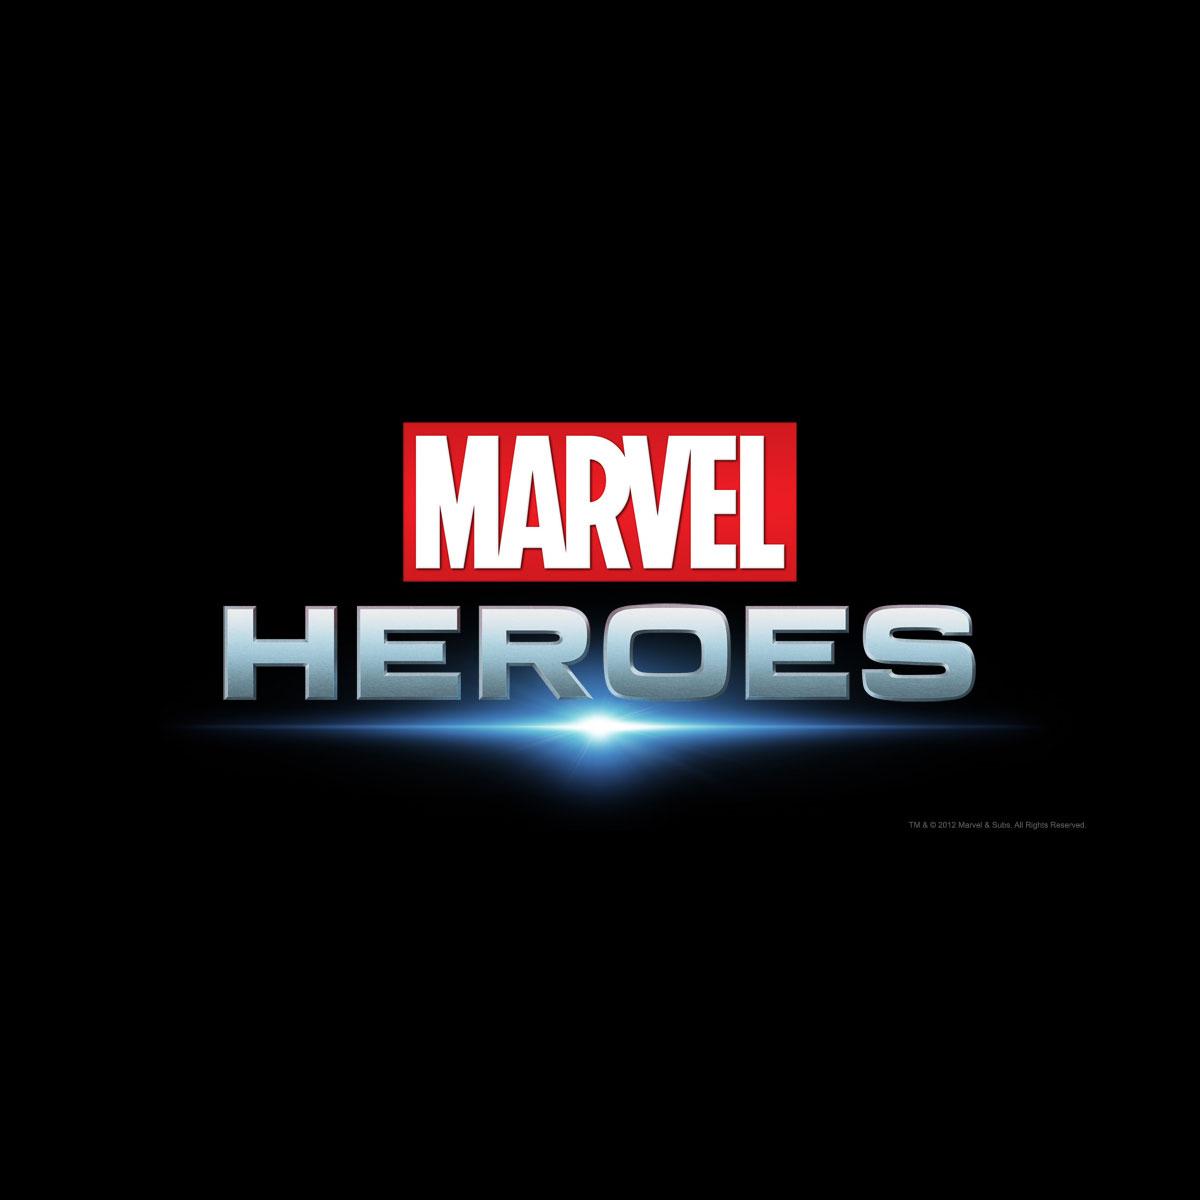 marvel-heroes-final-logo